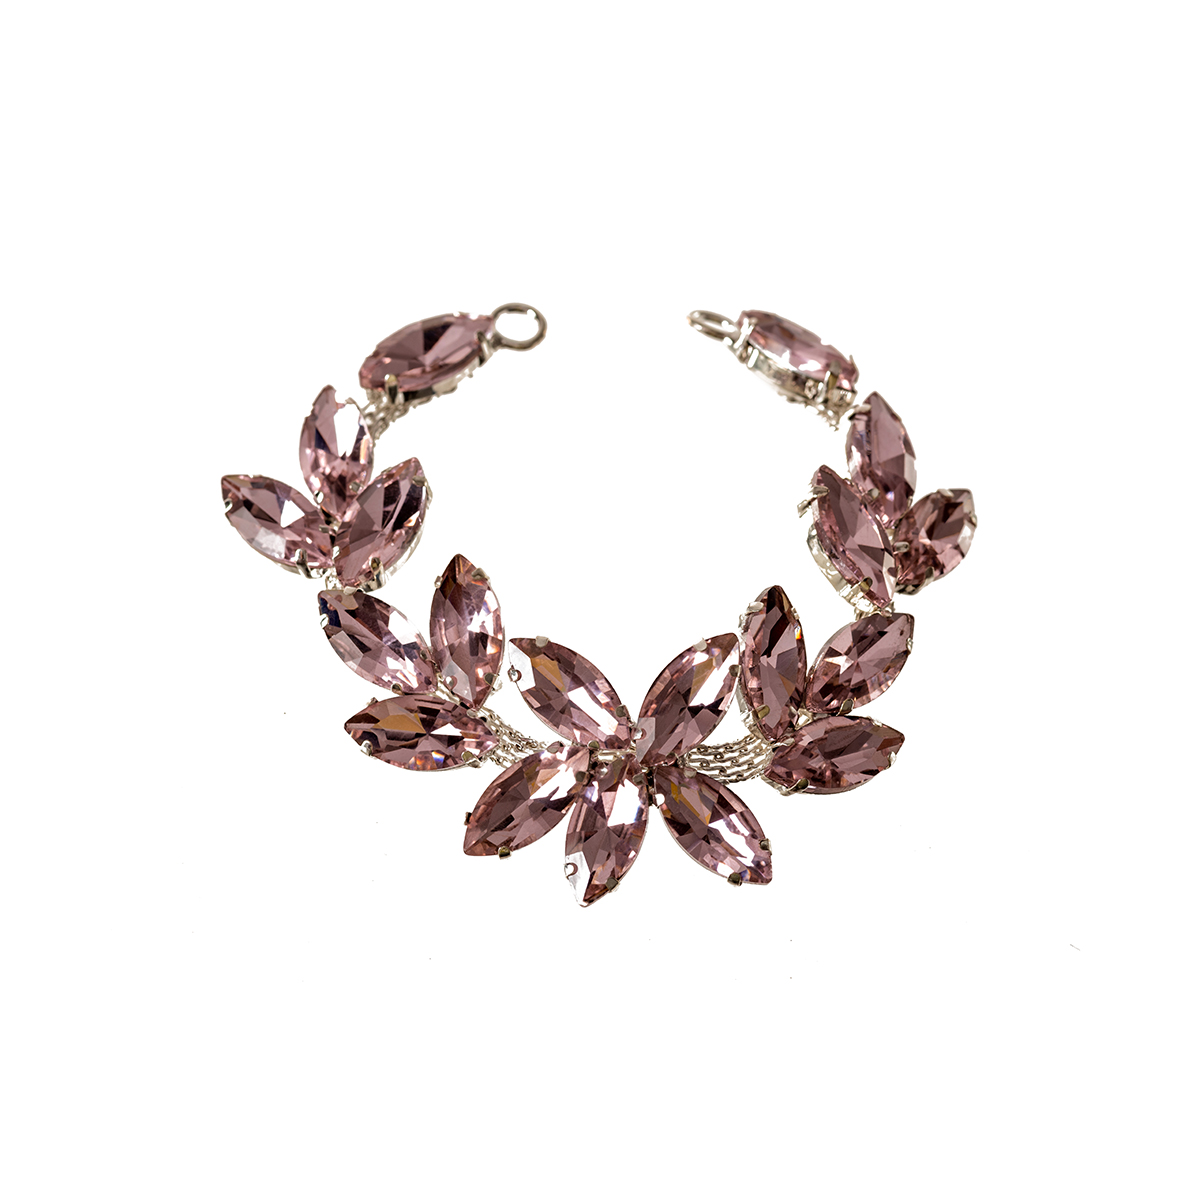 Rhinestone-Diamante-Motif-Applique-Sew-on-Crystal-Patch-for-Wedding-Bridal-Dress thumbnail 20